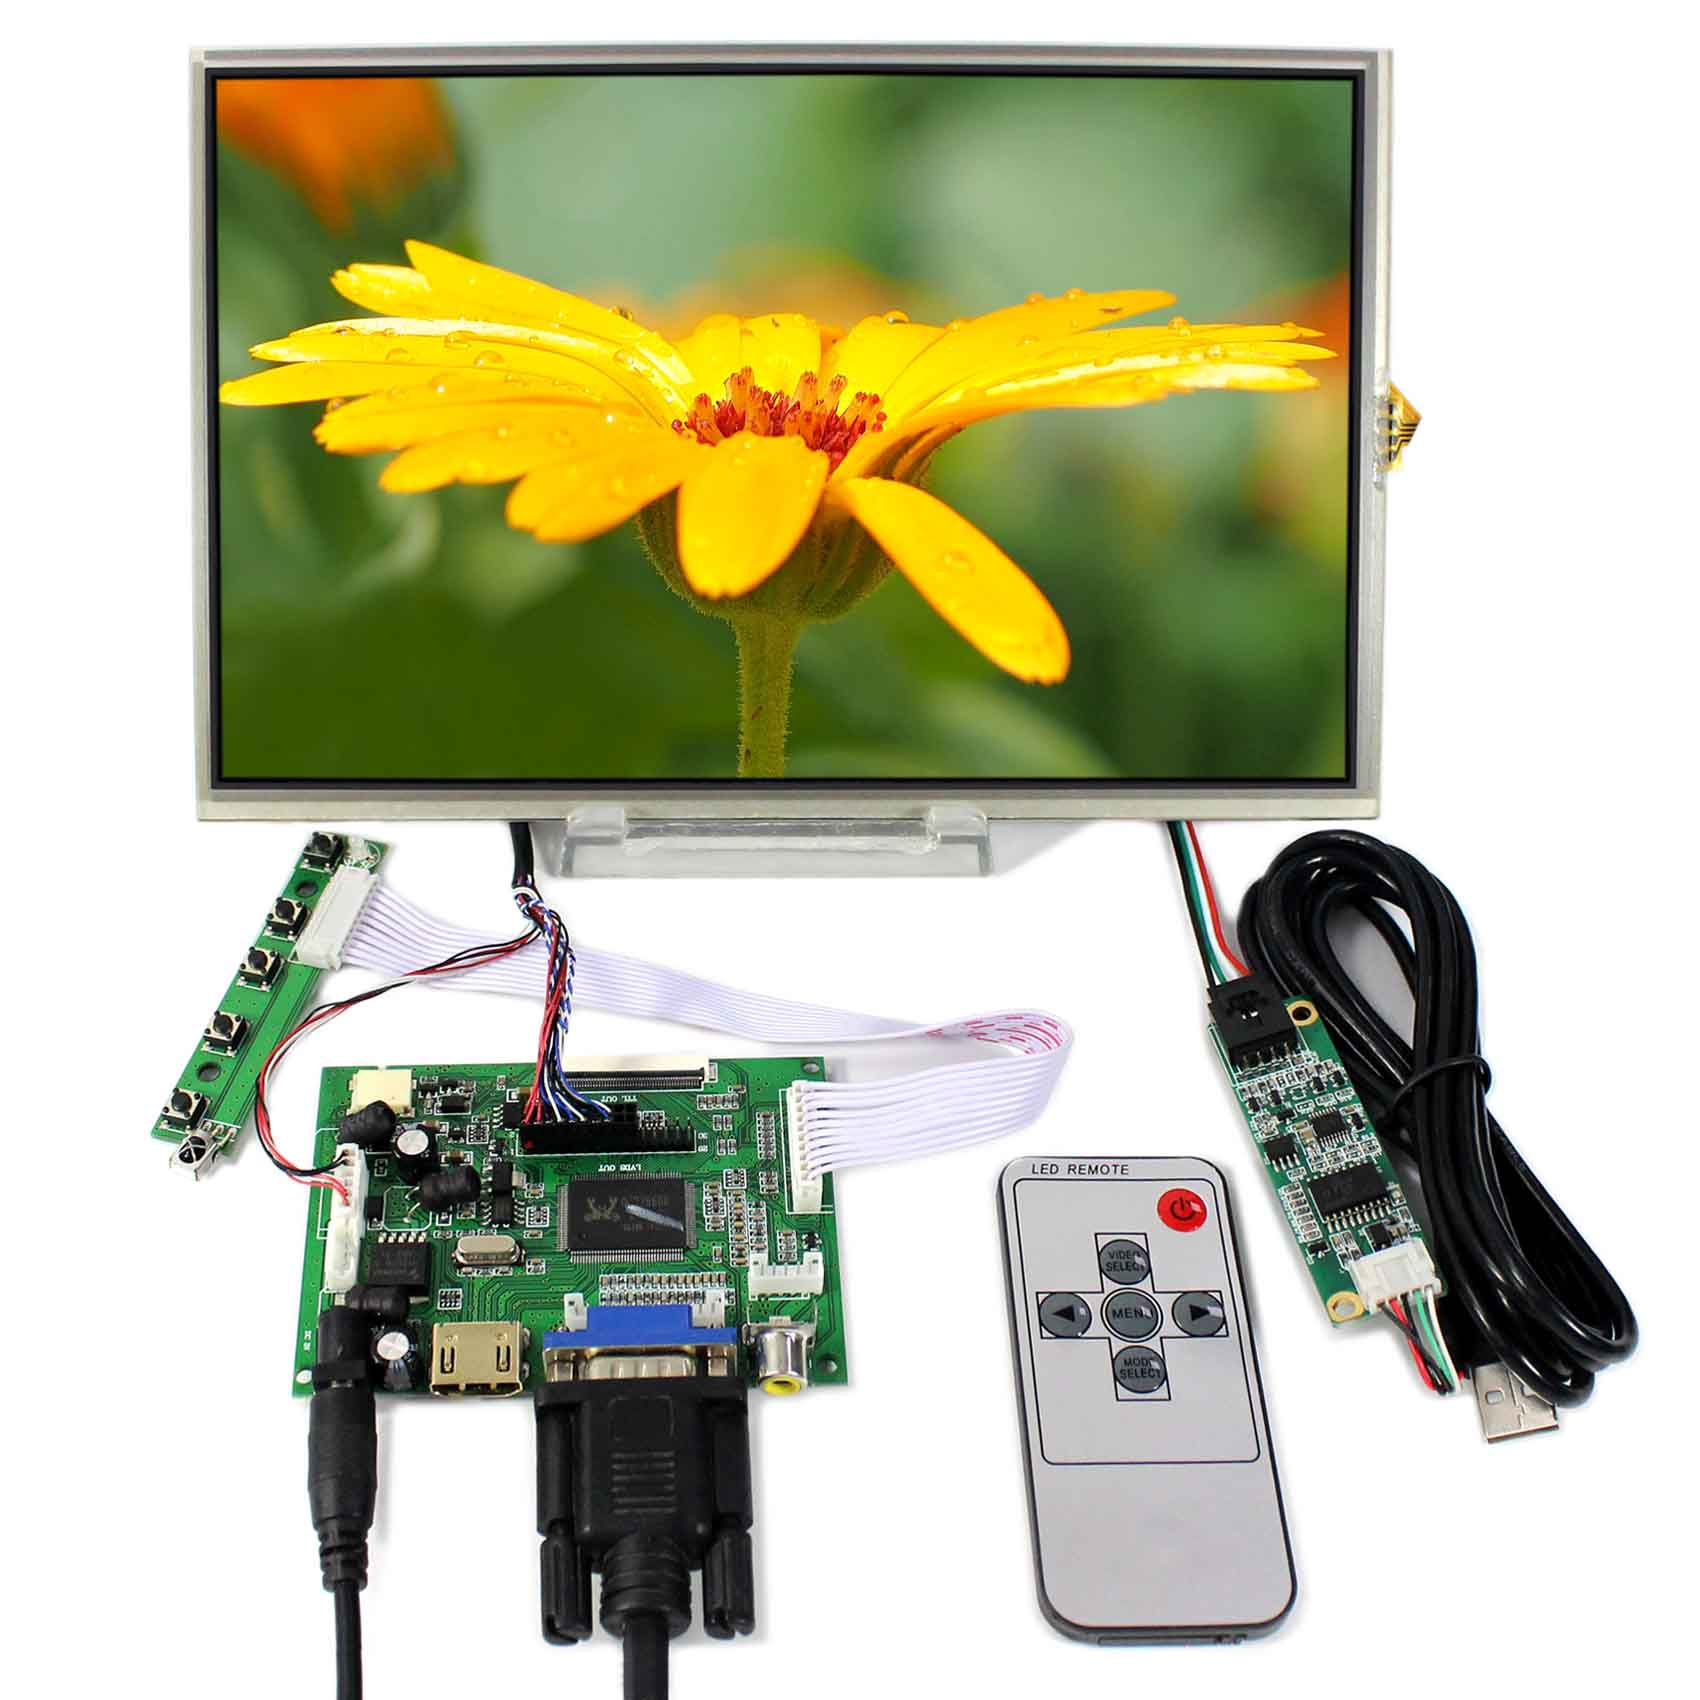 HDMI+VGA+2AV LCD Controller Board With 10.1inch 1280x800 B101EW05 LP101WX1 Touch LCD hdmi dvi vga lcd controller board 10 1inch b101ew05 hsd101pww1 1280 800 lcd panel